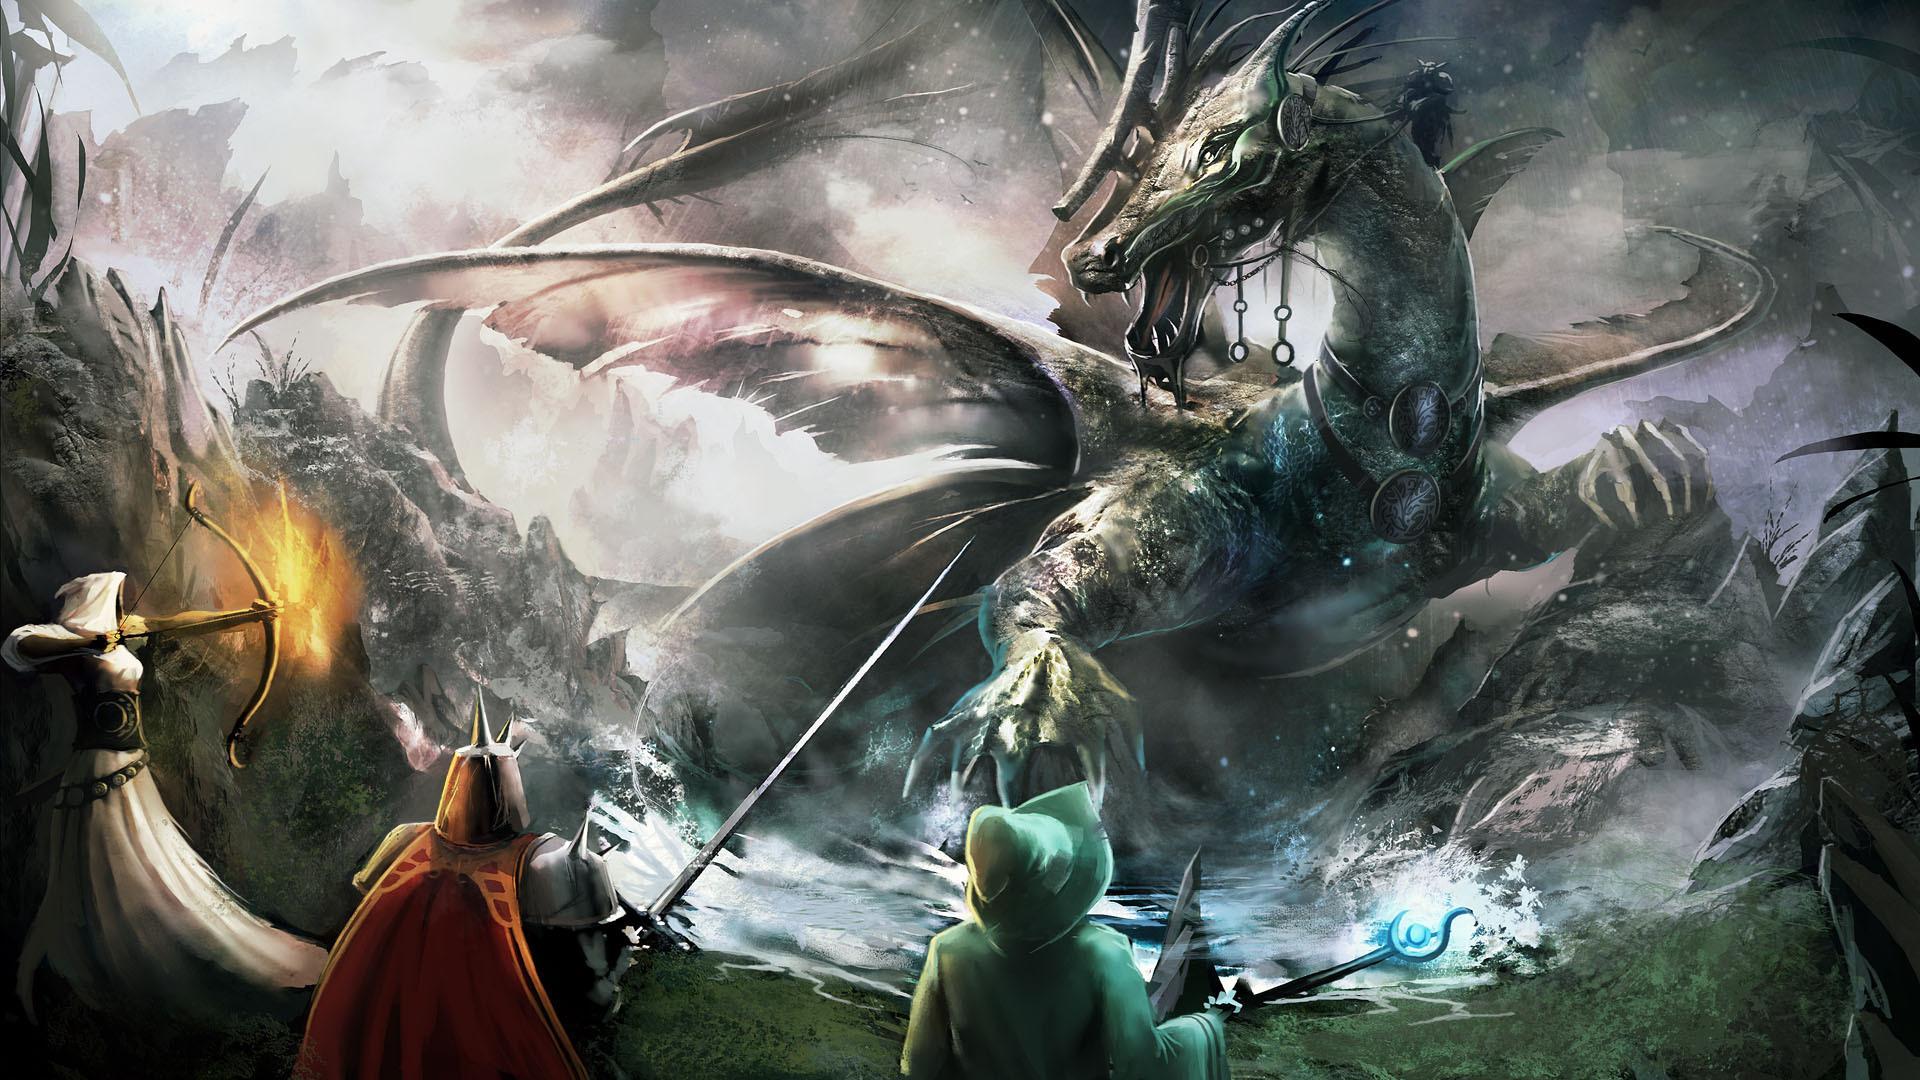 Anime Dragon Wallpaper Wallpapersafari